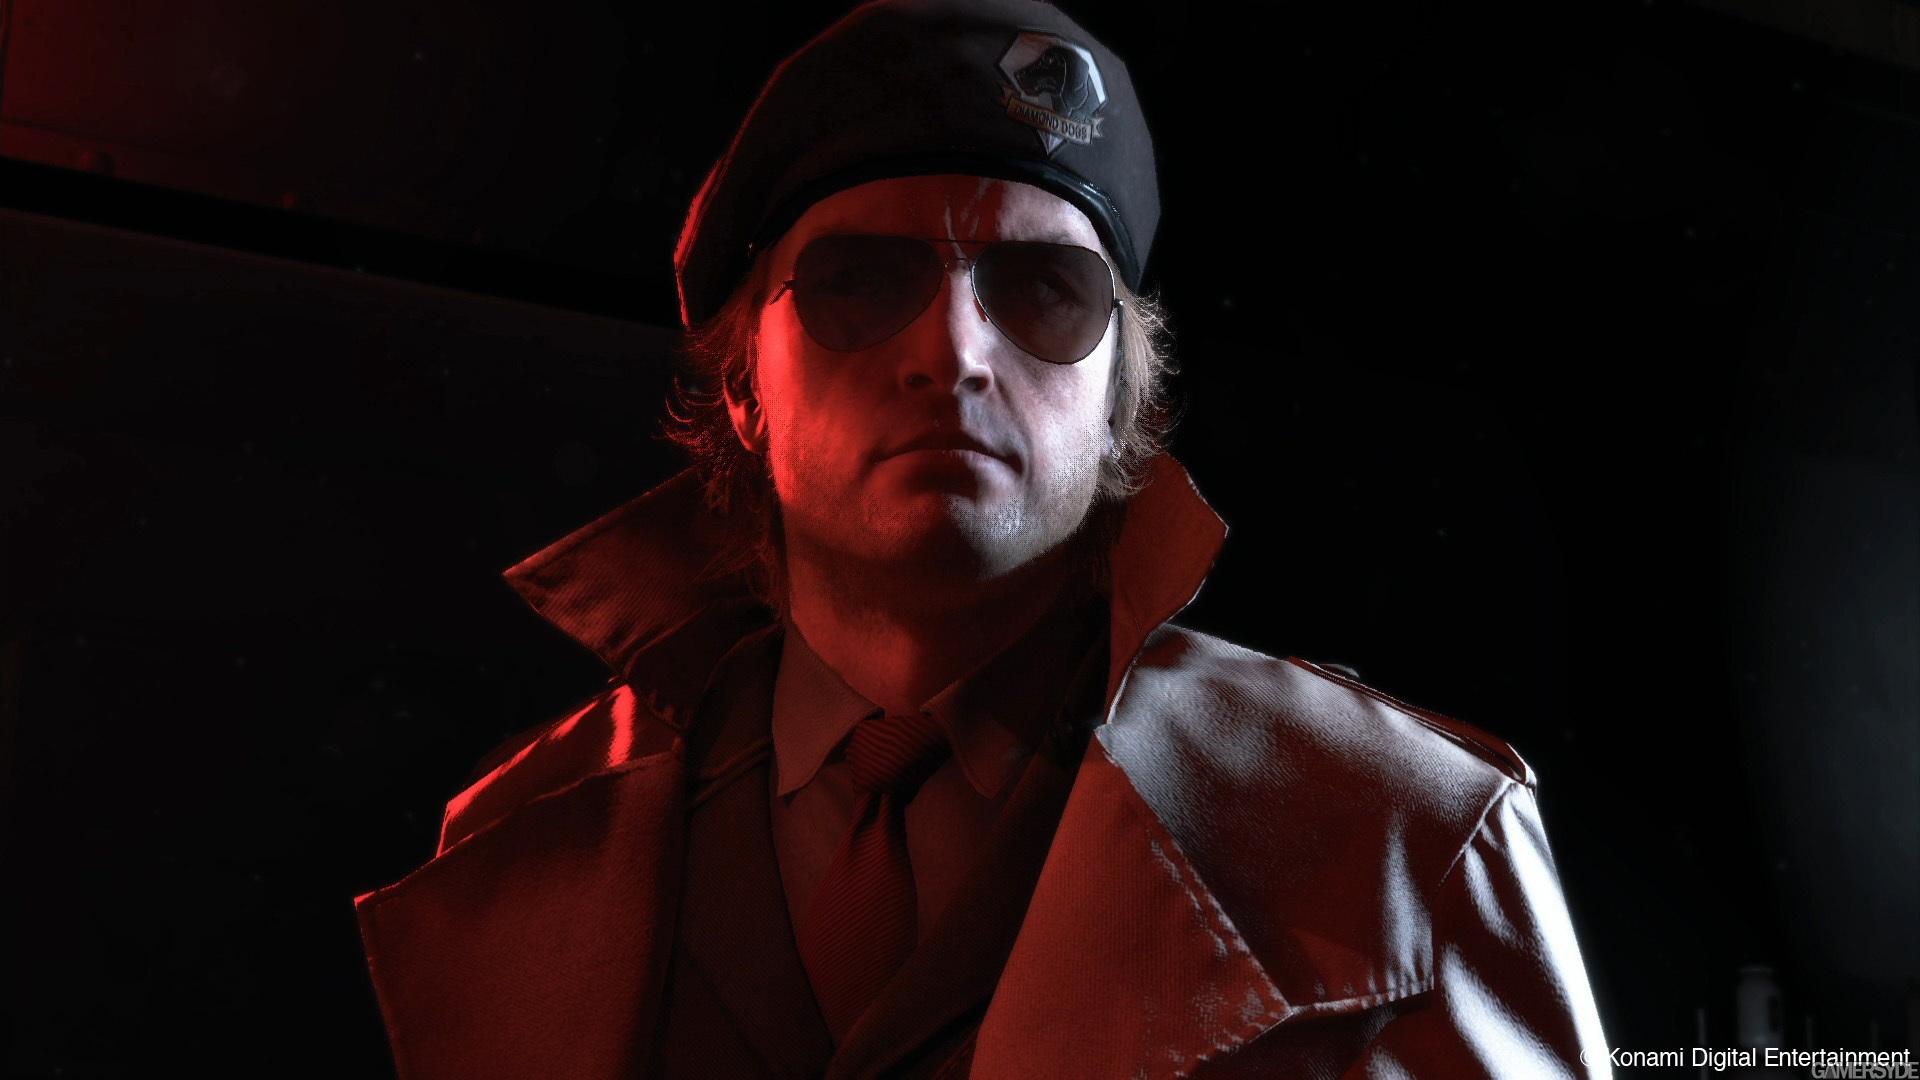 image metal gear solid v the phantom pain 22381 2584 0016 بازگشت پر سر و صدای مار بی صدا ! | تحلیل و بررسی نمایش Metal Gear Solid V : The Phantom Pain در نمایشگاه E3 2013